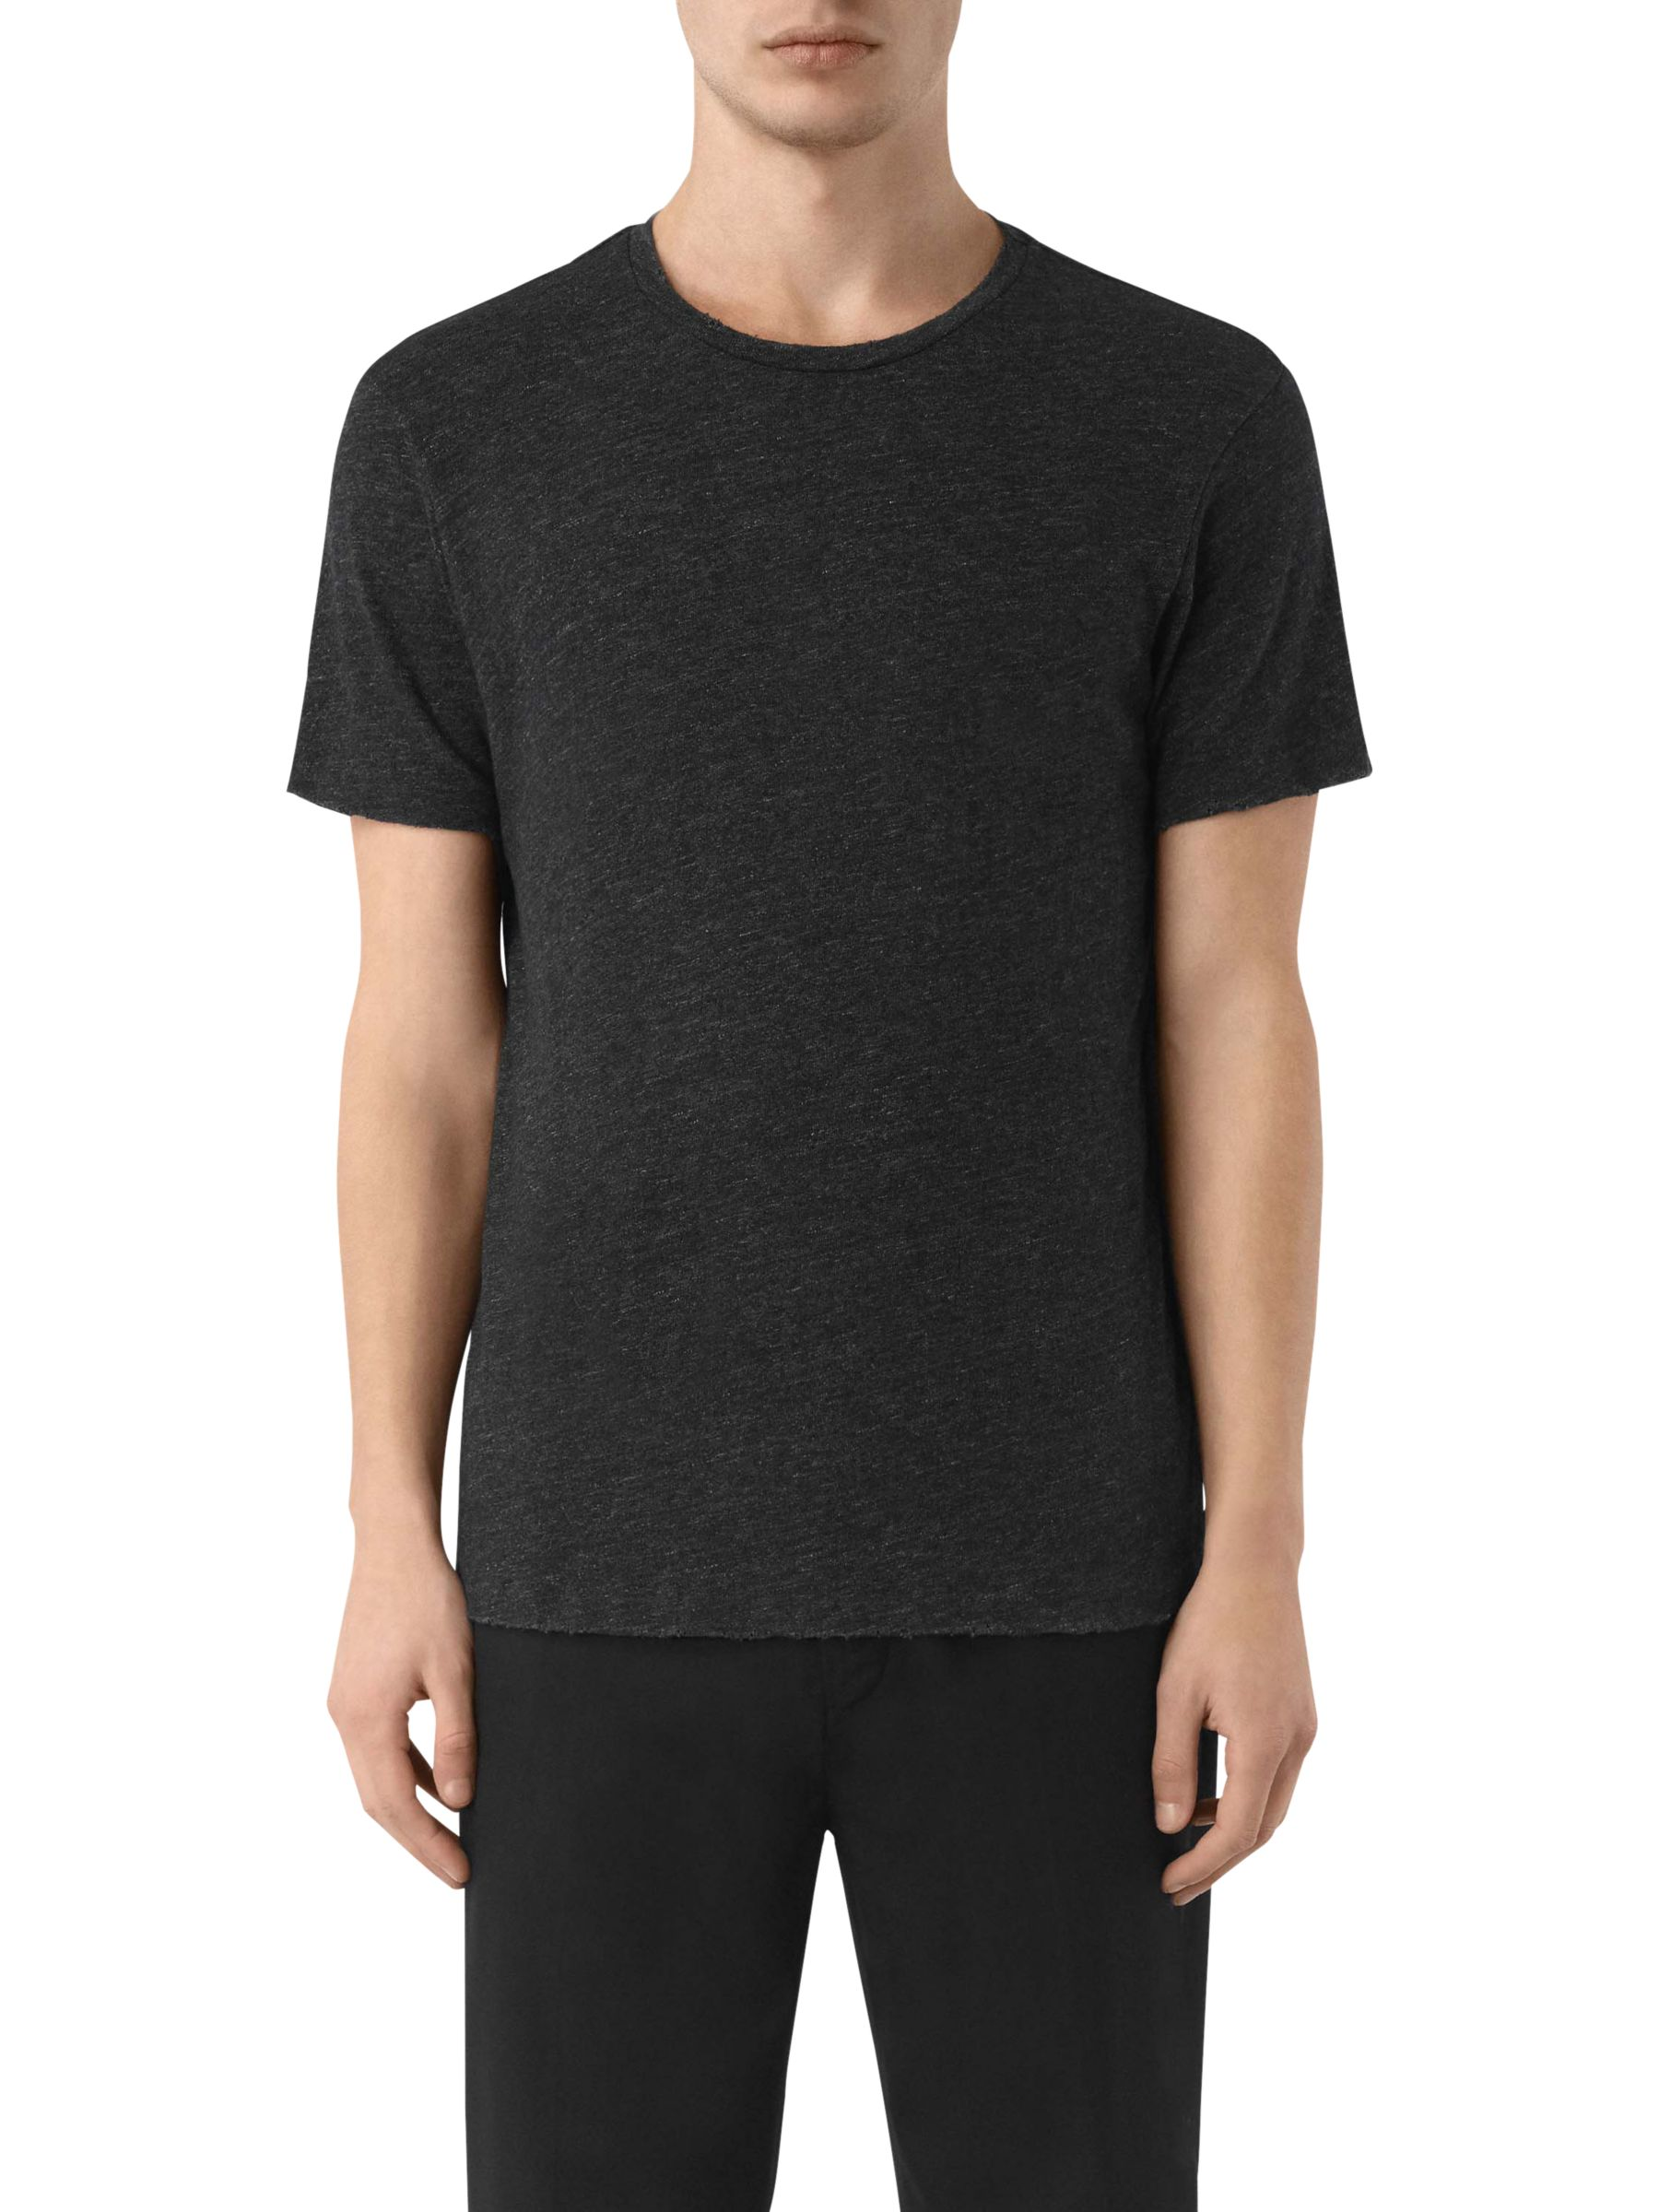 AllSaints AllSaints Schans Short Sleeve Crew T-Shirt